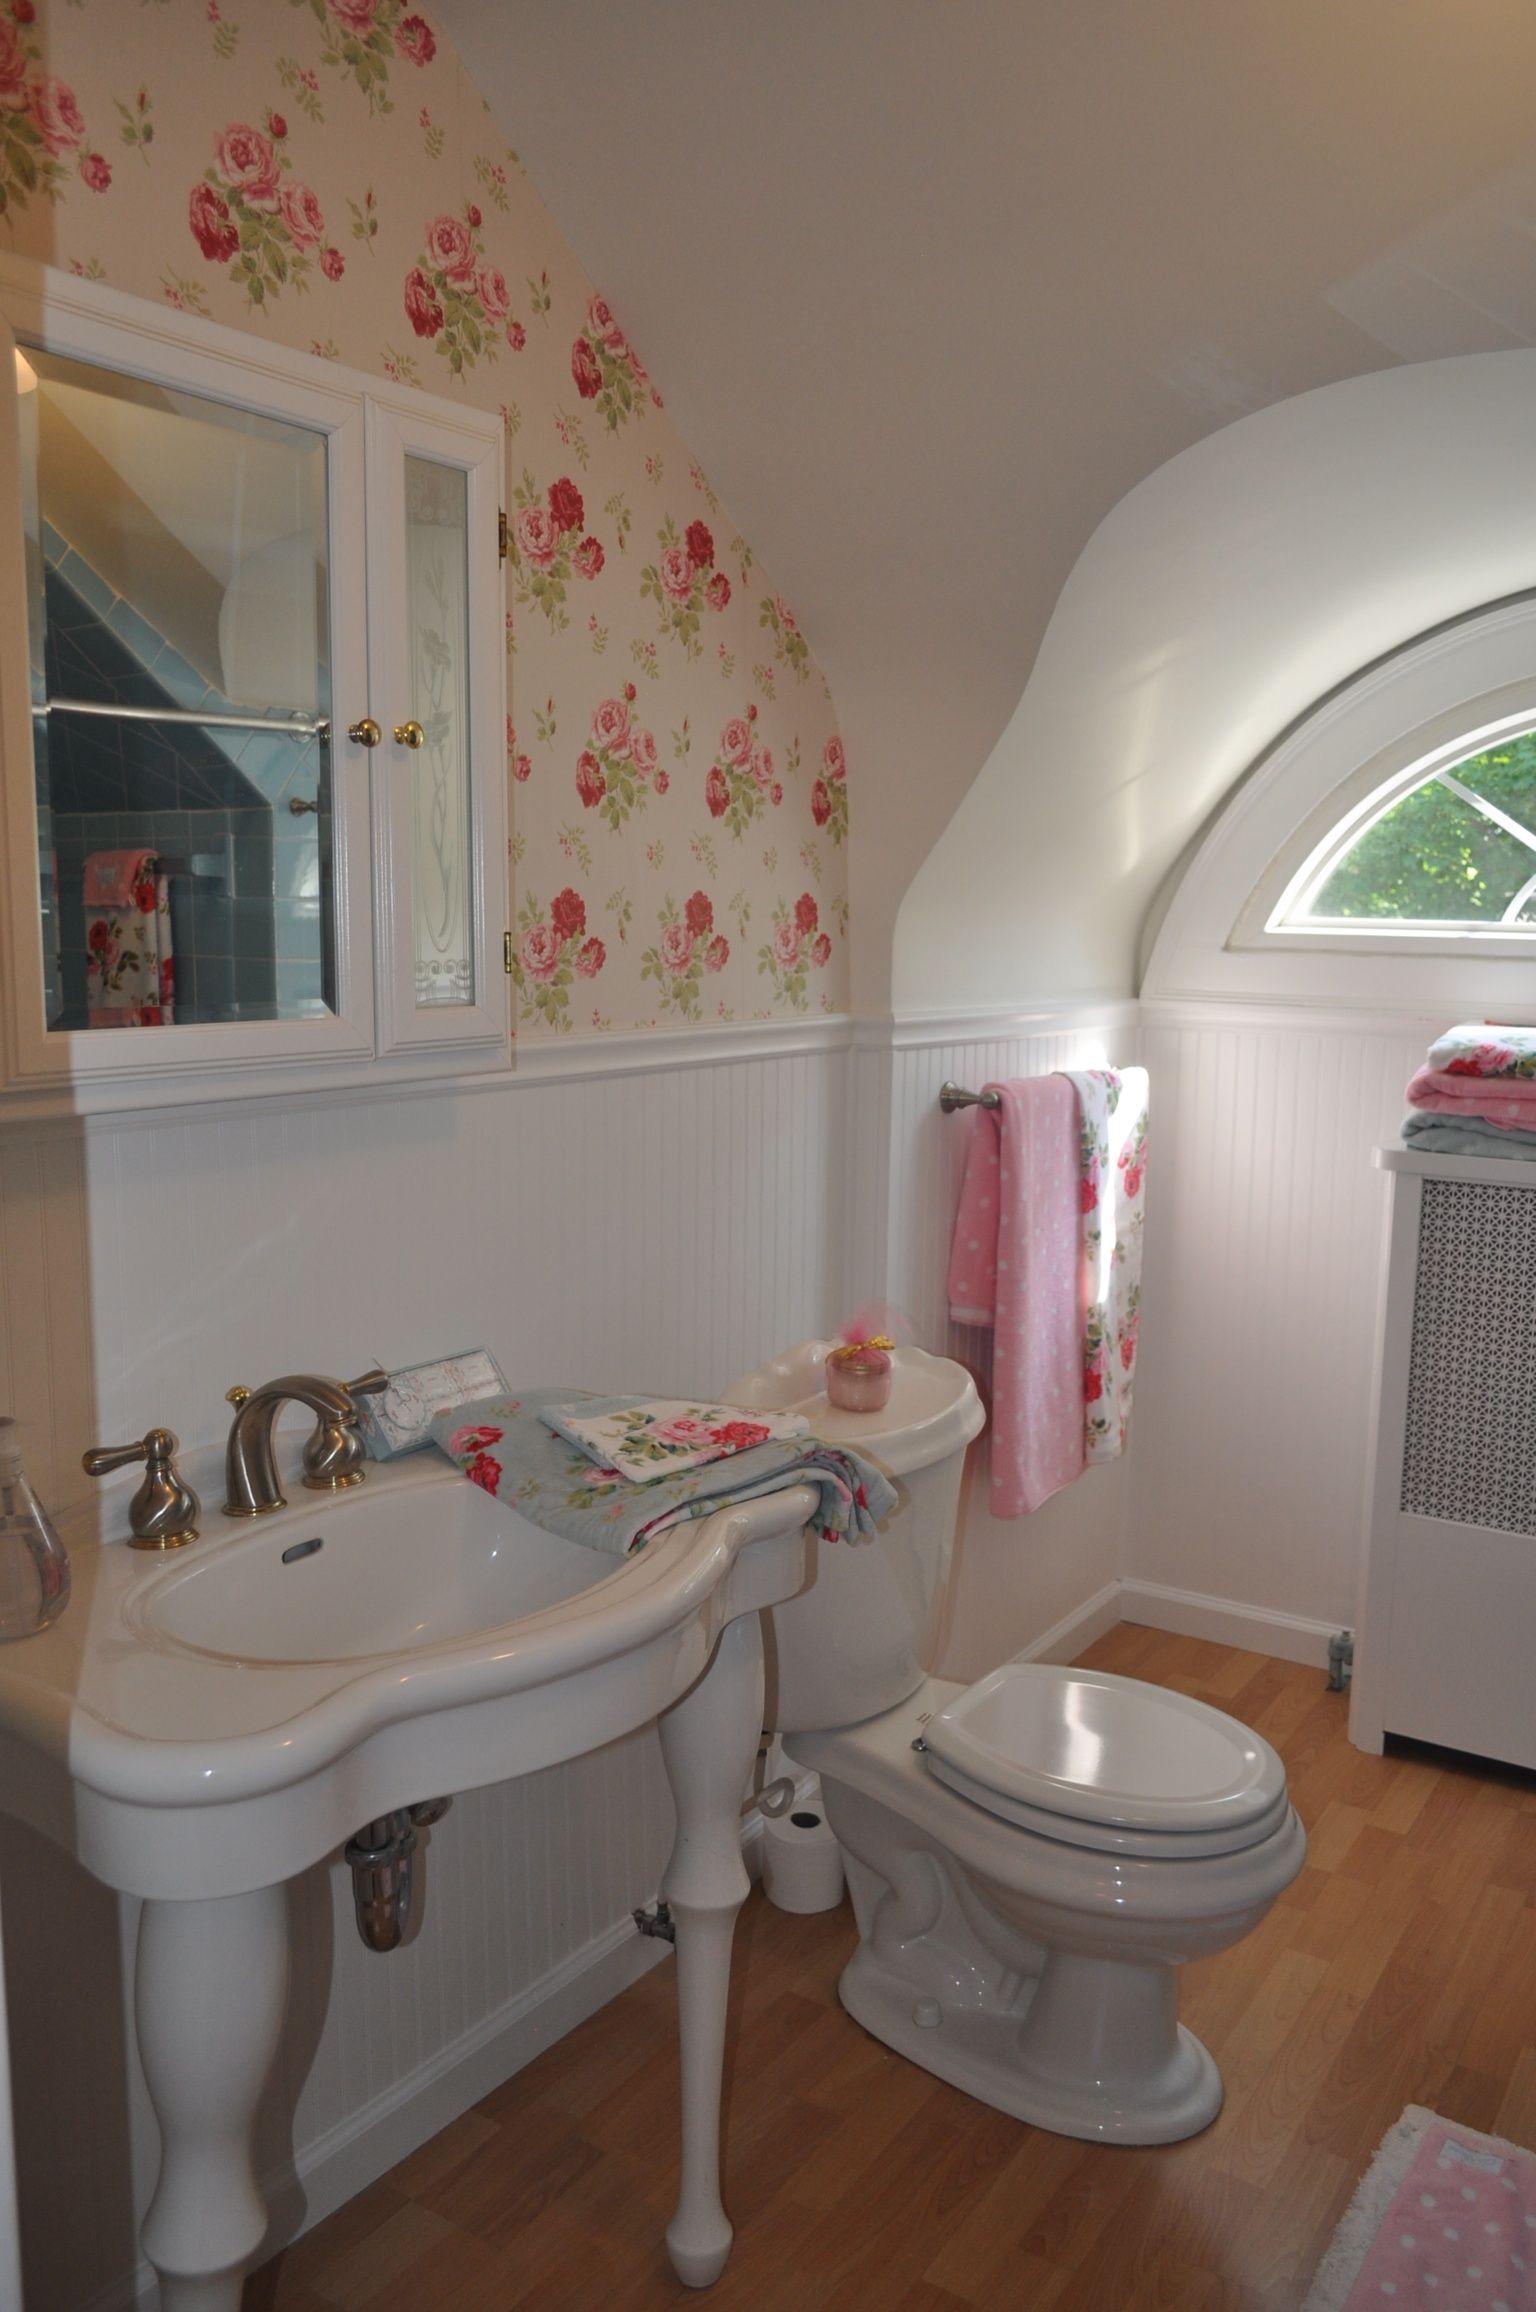 20 Perfect Vintage Look Bathroom Tile Samples | interior design ...